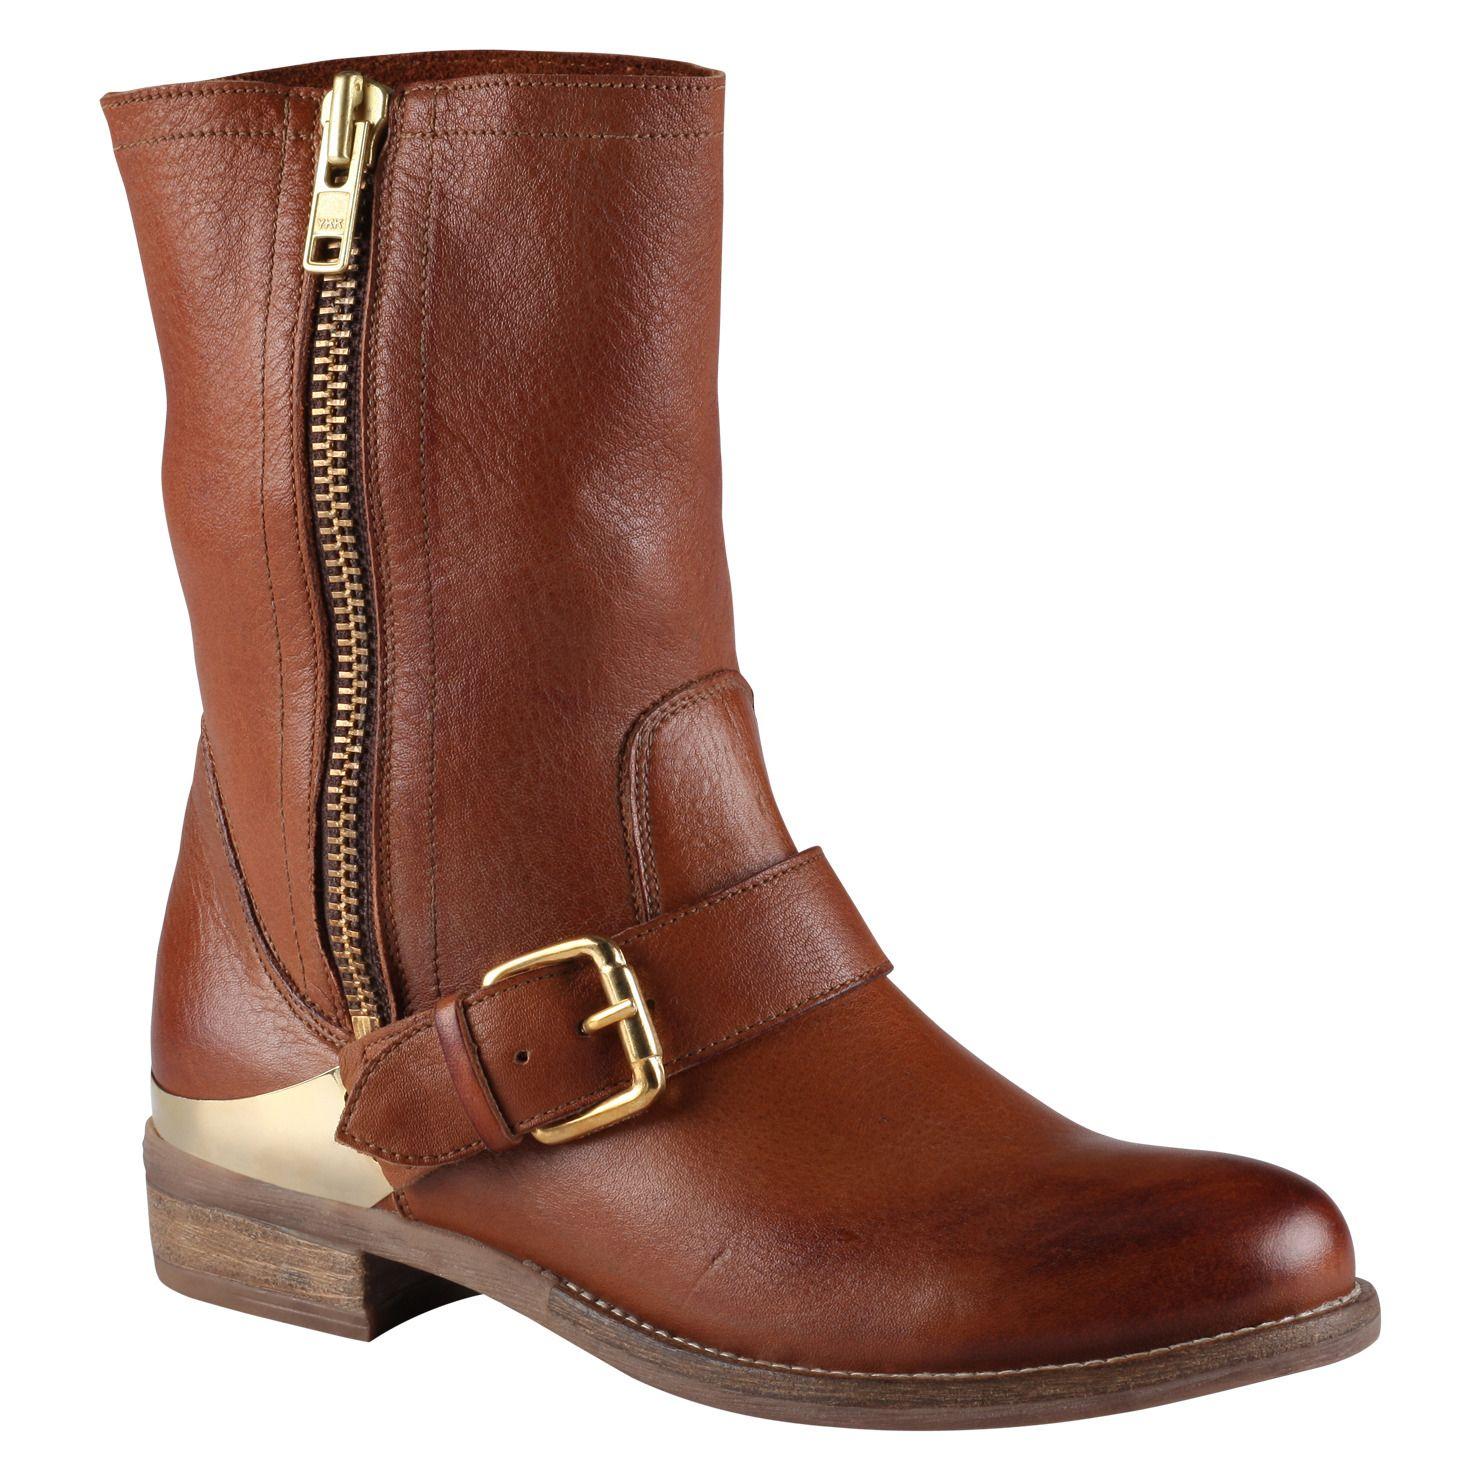 BURKINAFASO femmes'mollet bottes bottes bottes for salALDO Chaussures dc2207